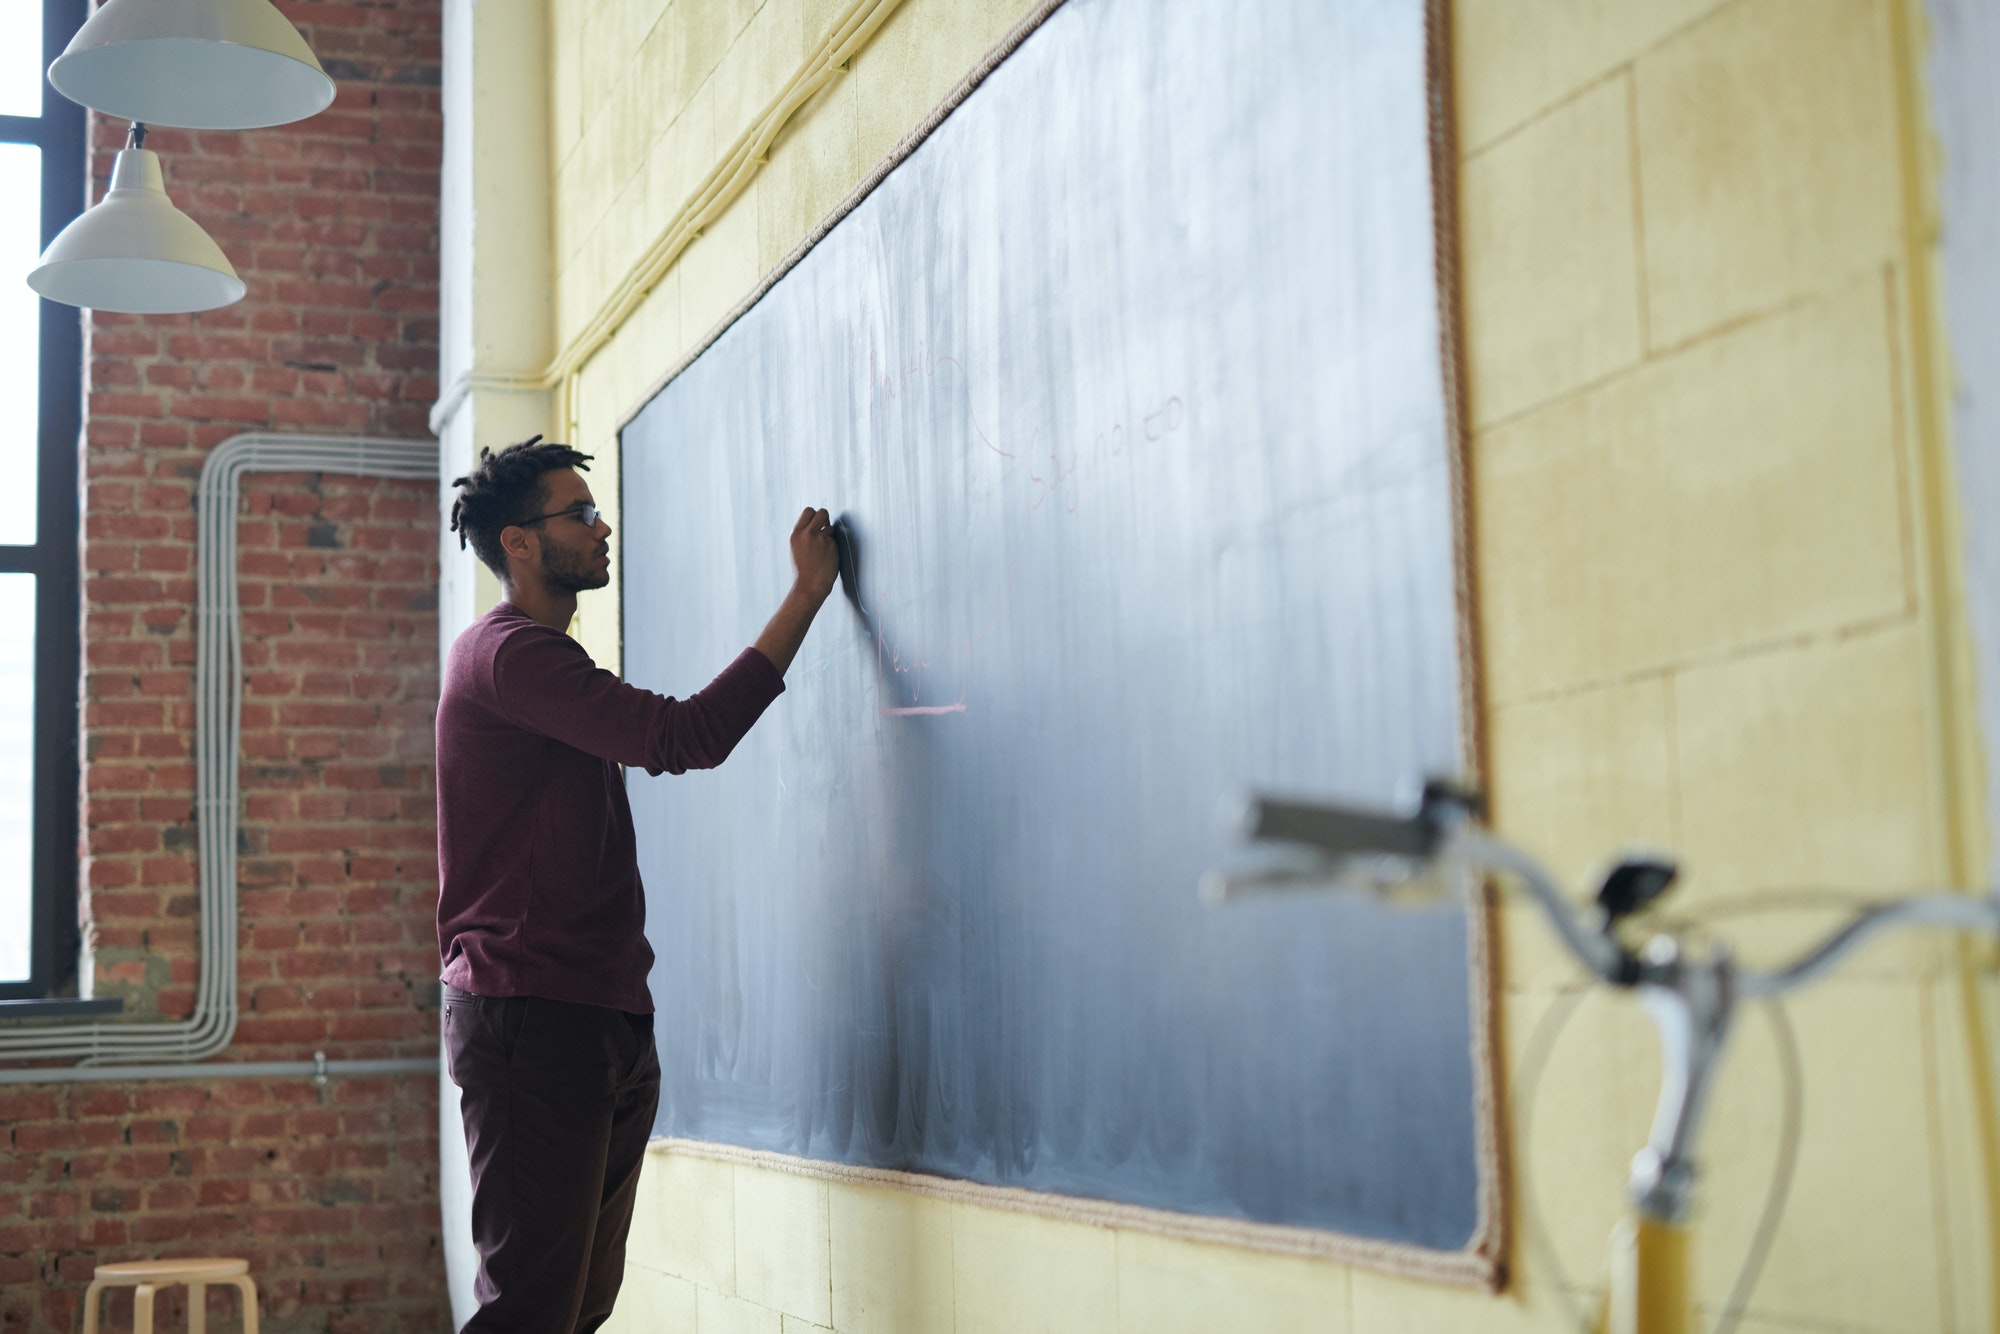 A teacher writes on a blackboard